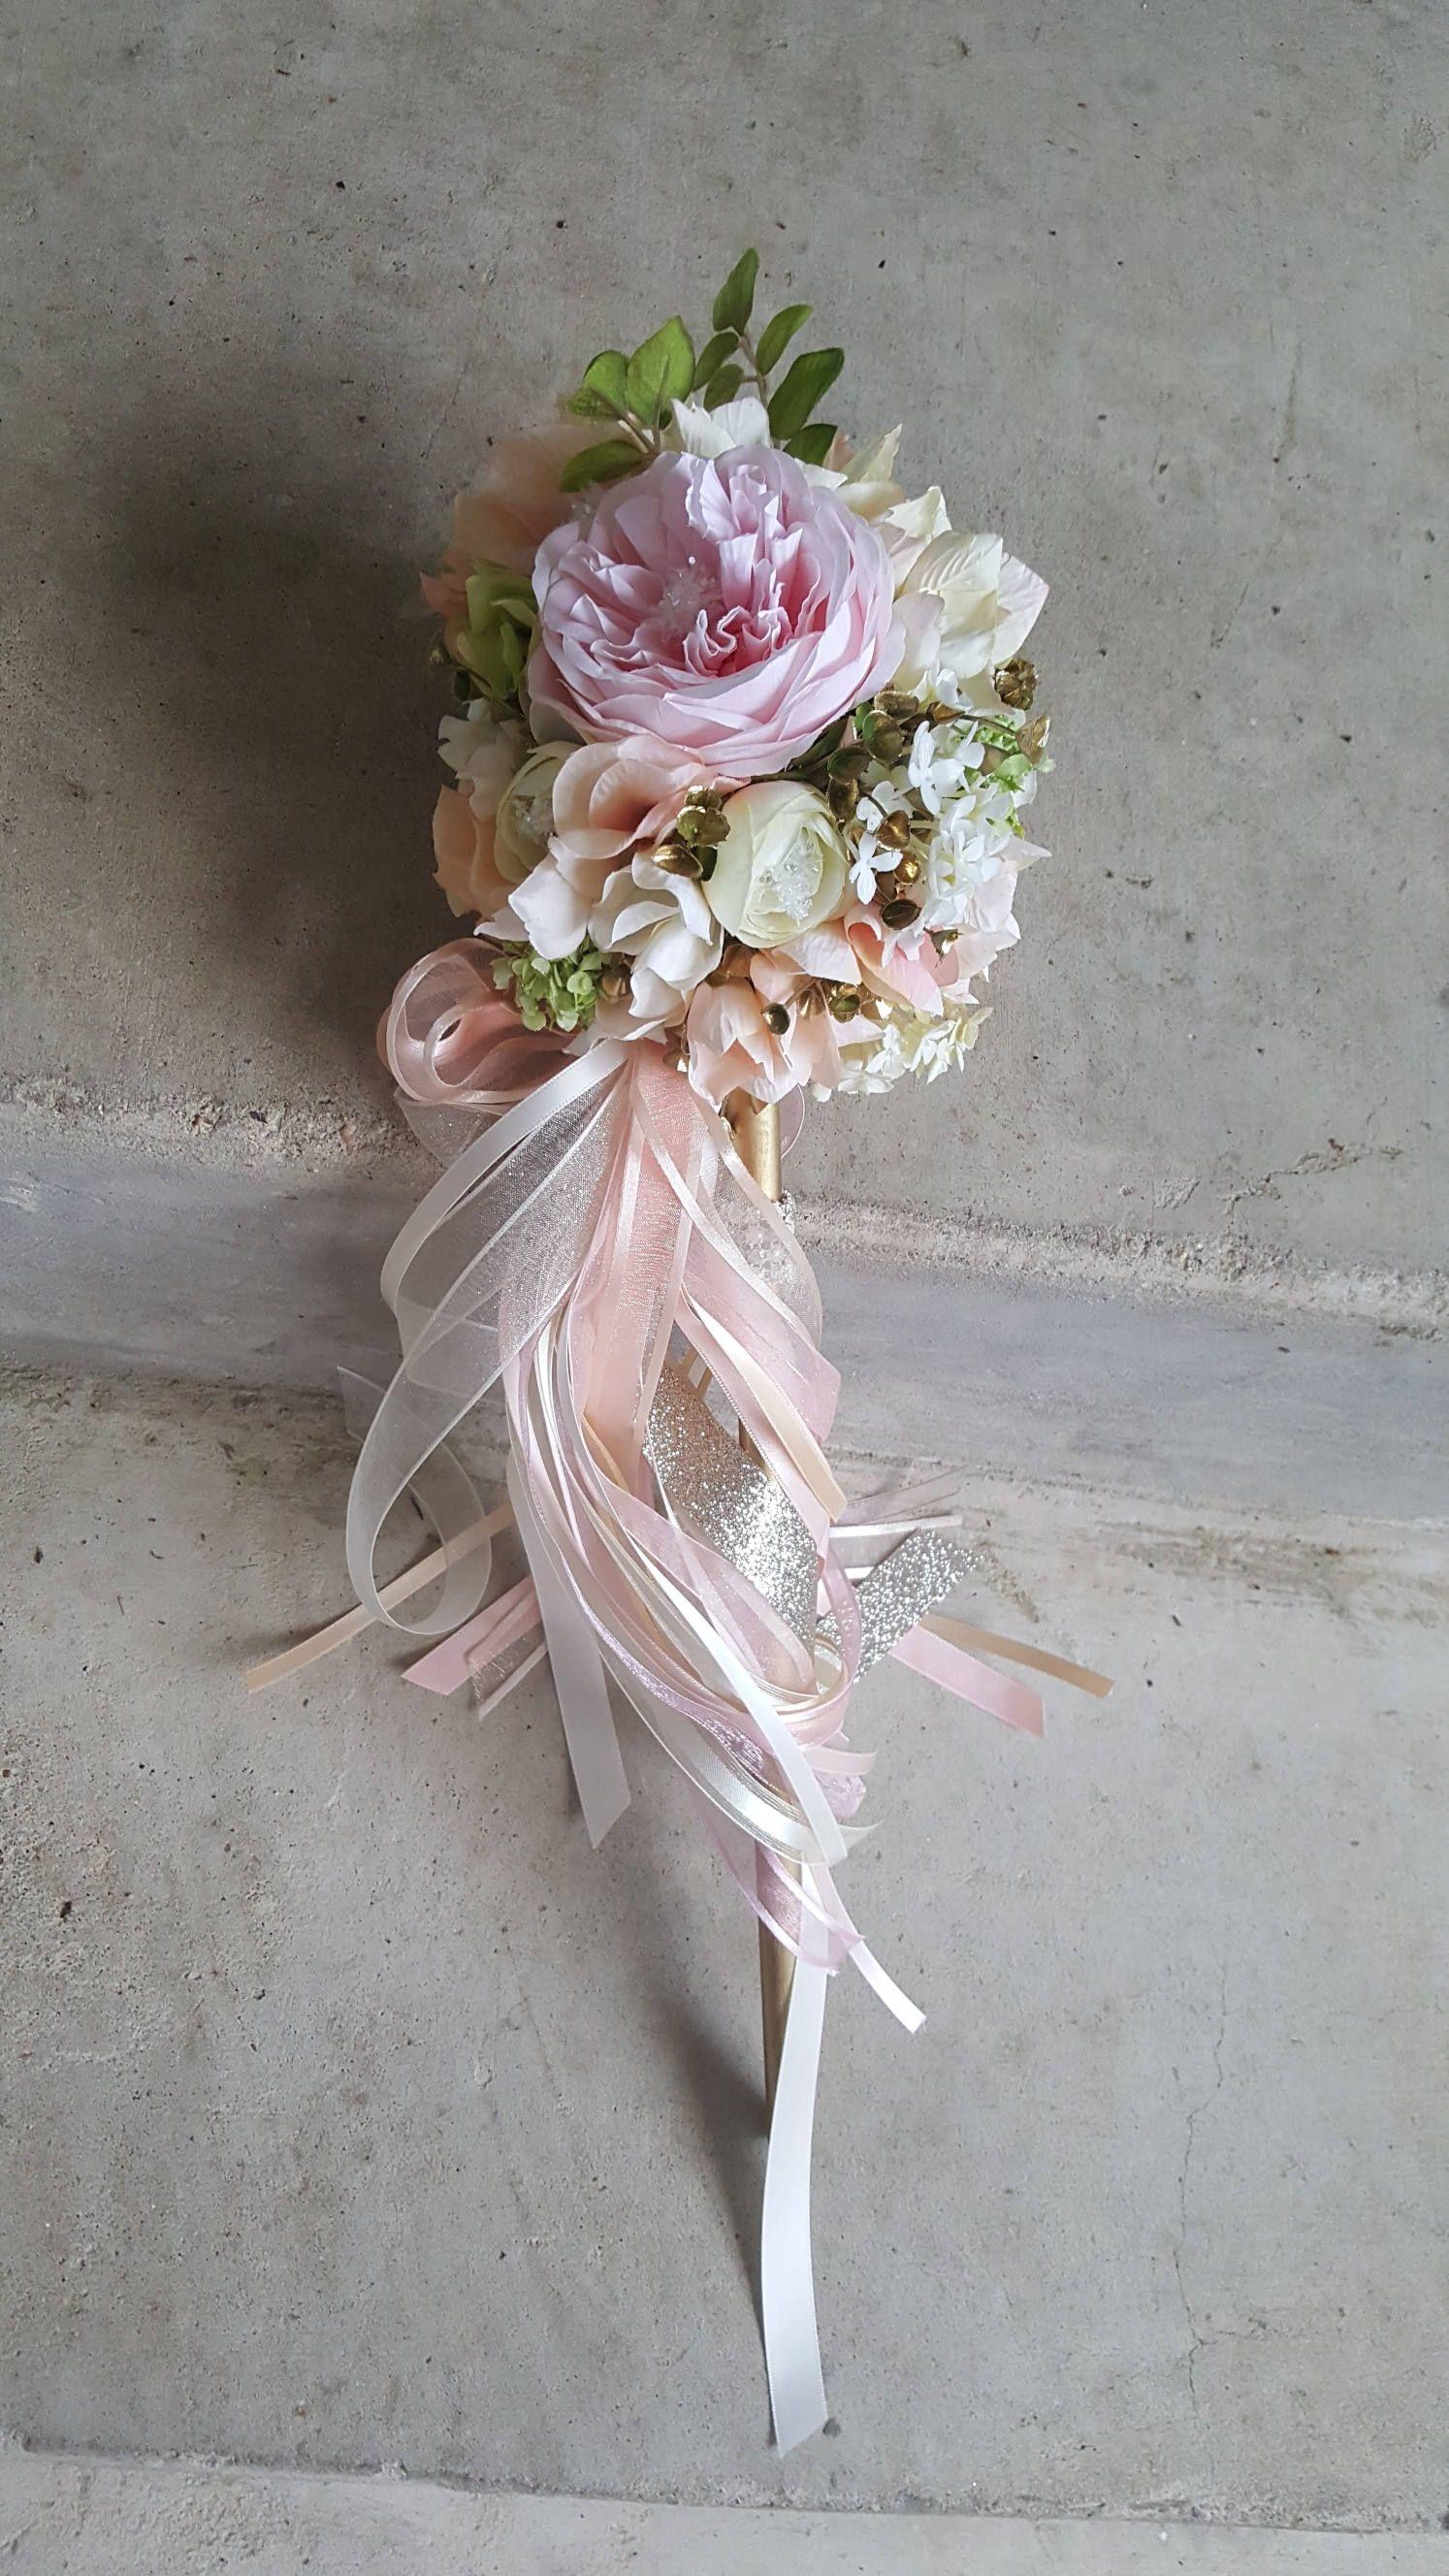 Custom order for one flower girl pom wand ivory blush pink champagne custom order for one flower girl pom wand ivory blush pink champagne by kaartisticevents on etsy izmirmasajfo Choice Image